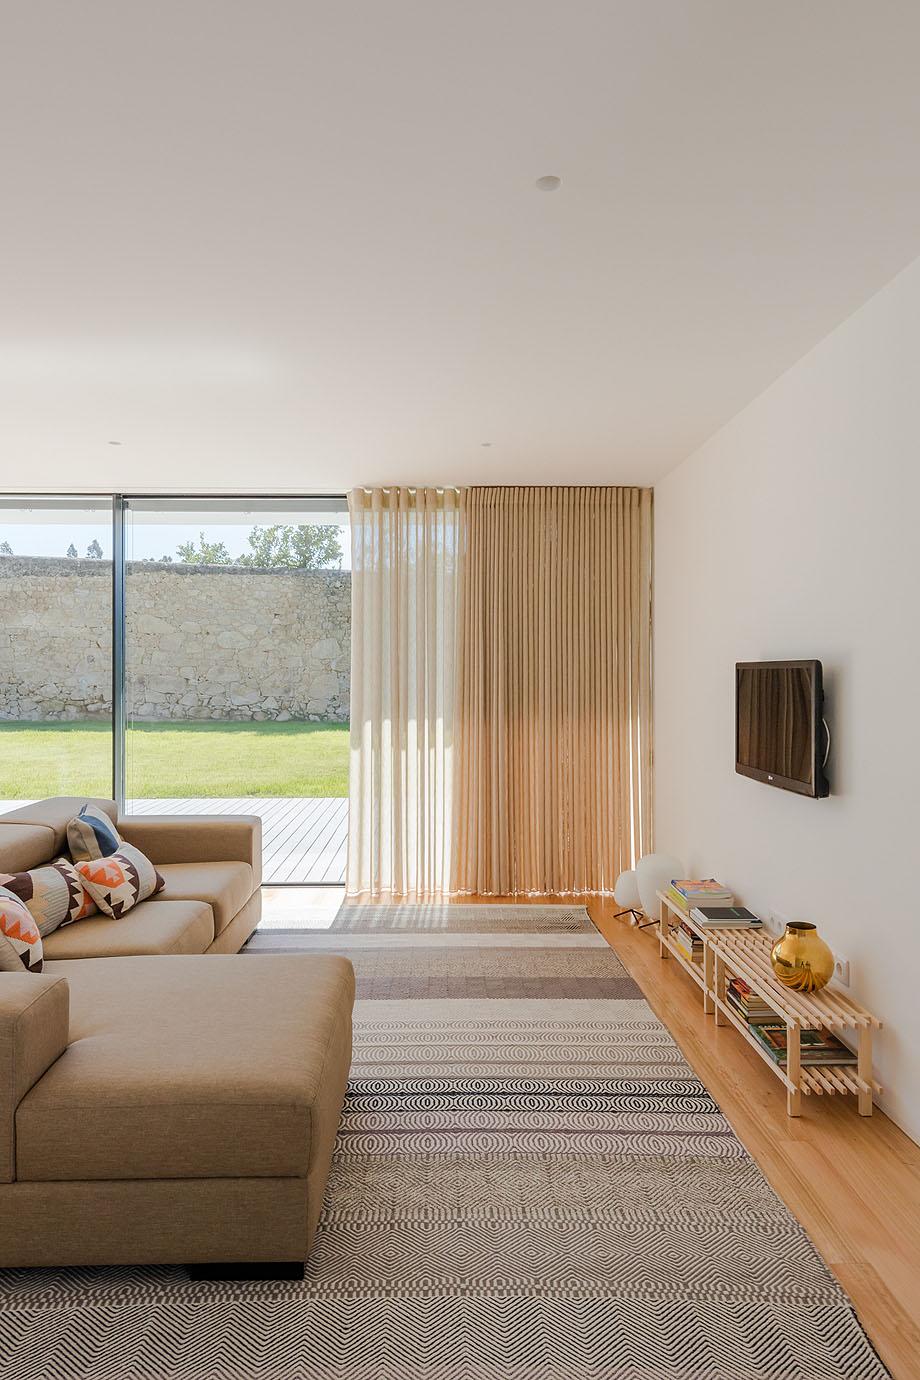 Casa Touguinha - Raulino Arquitecto (6)